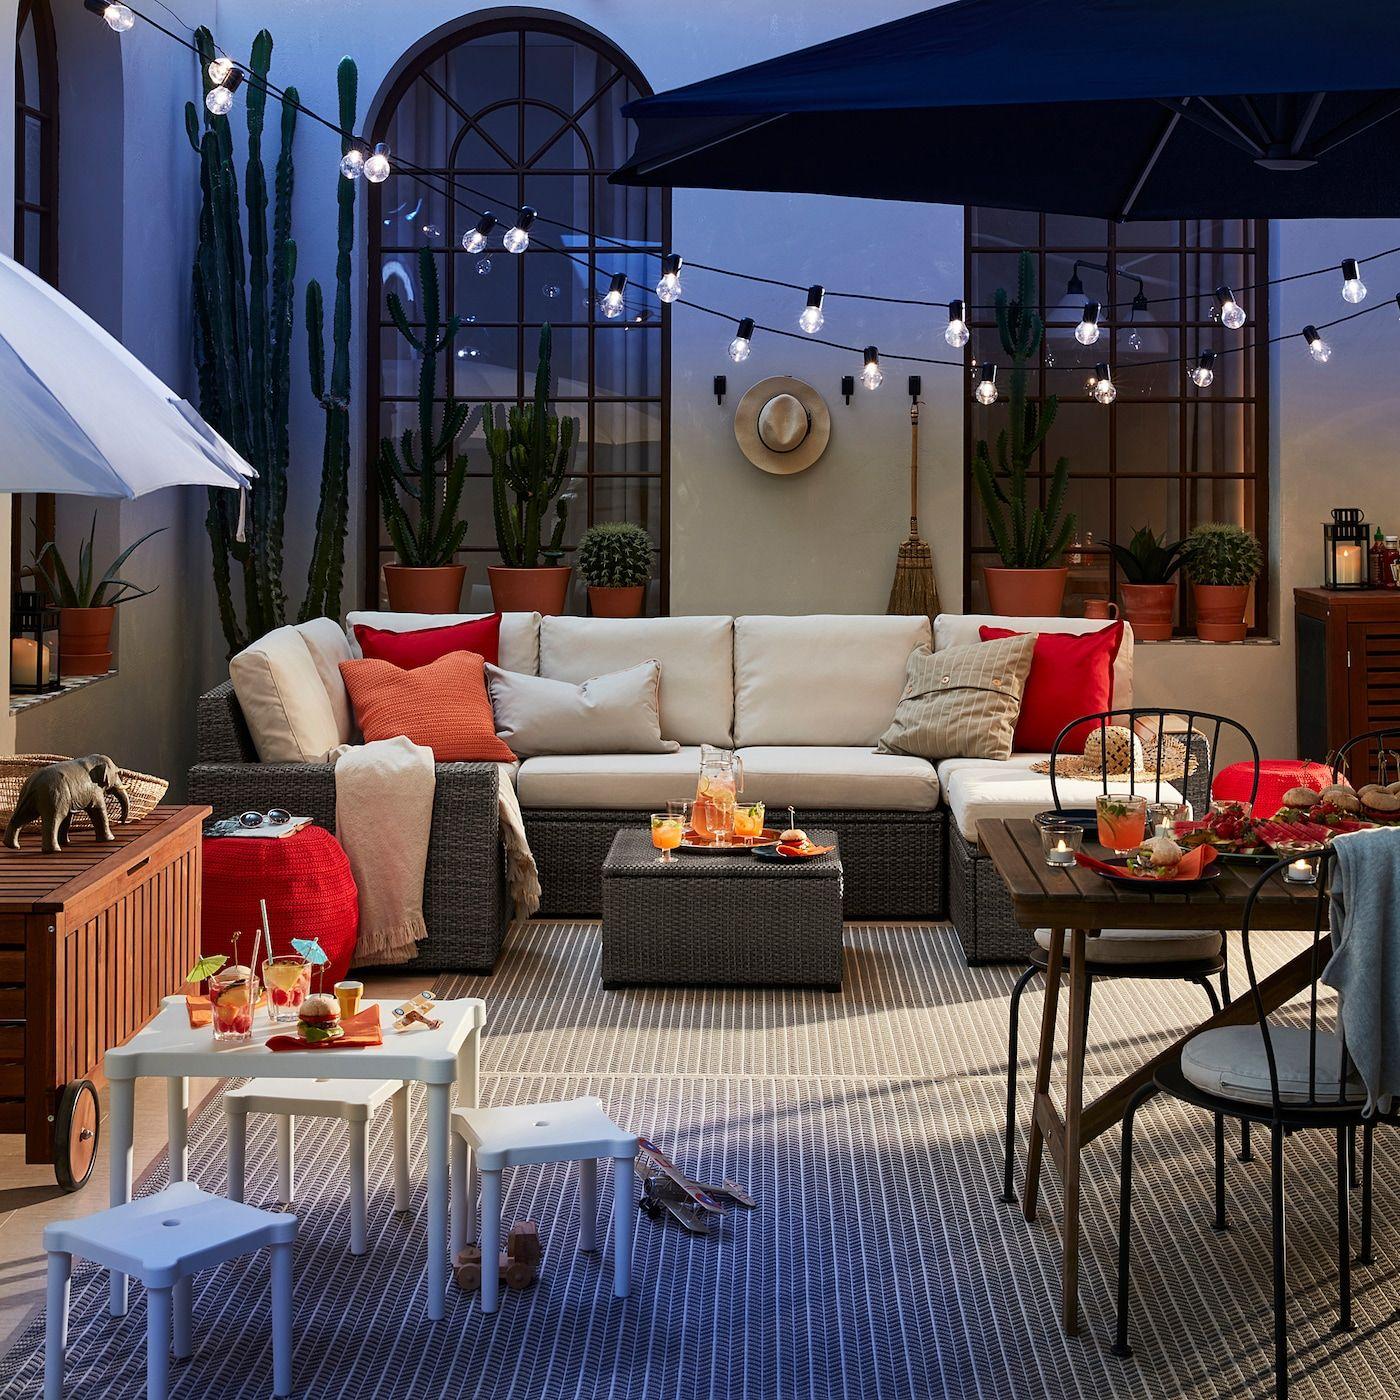 Solleron Modular Corner Sofa 4 Seat Outdoor With Footstool Dark Gray Froson Duvholmen Beige Ikea In 2020 Modular Corner Sofa Outdoor Patio Designs Patio Design